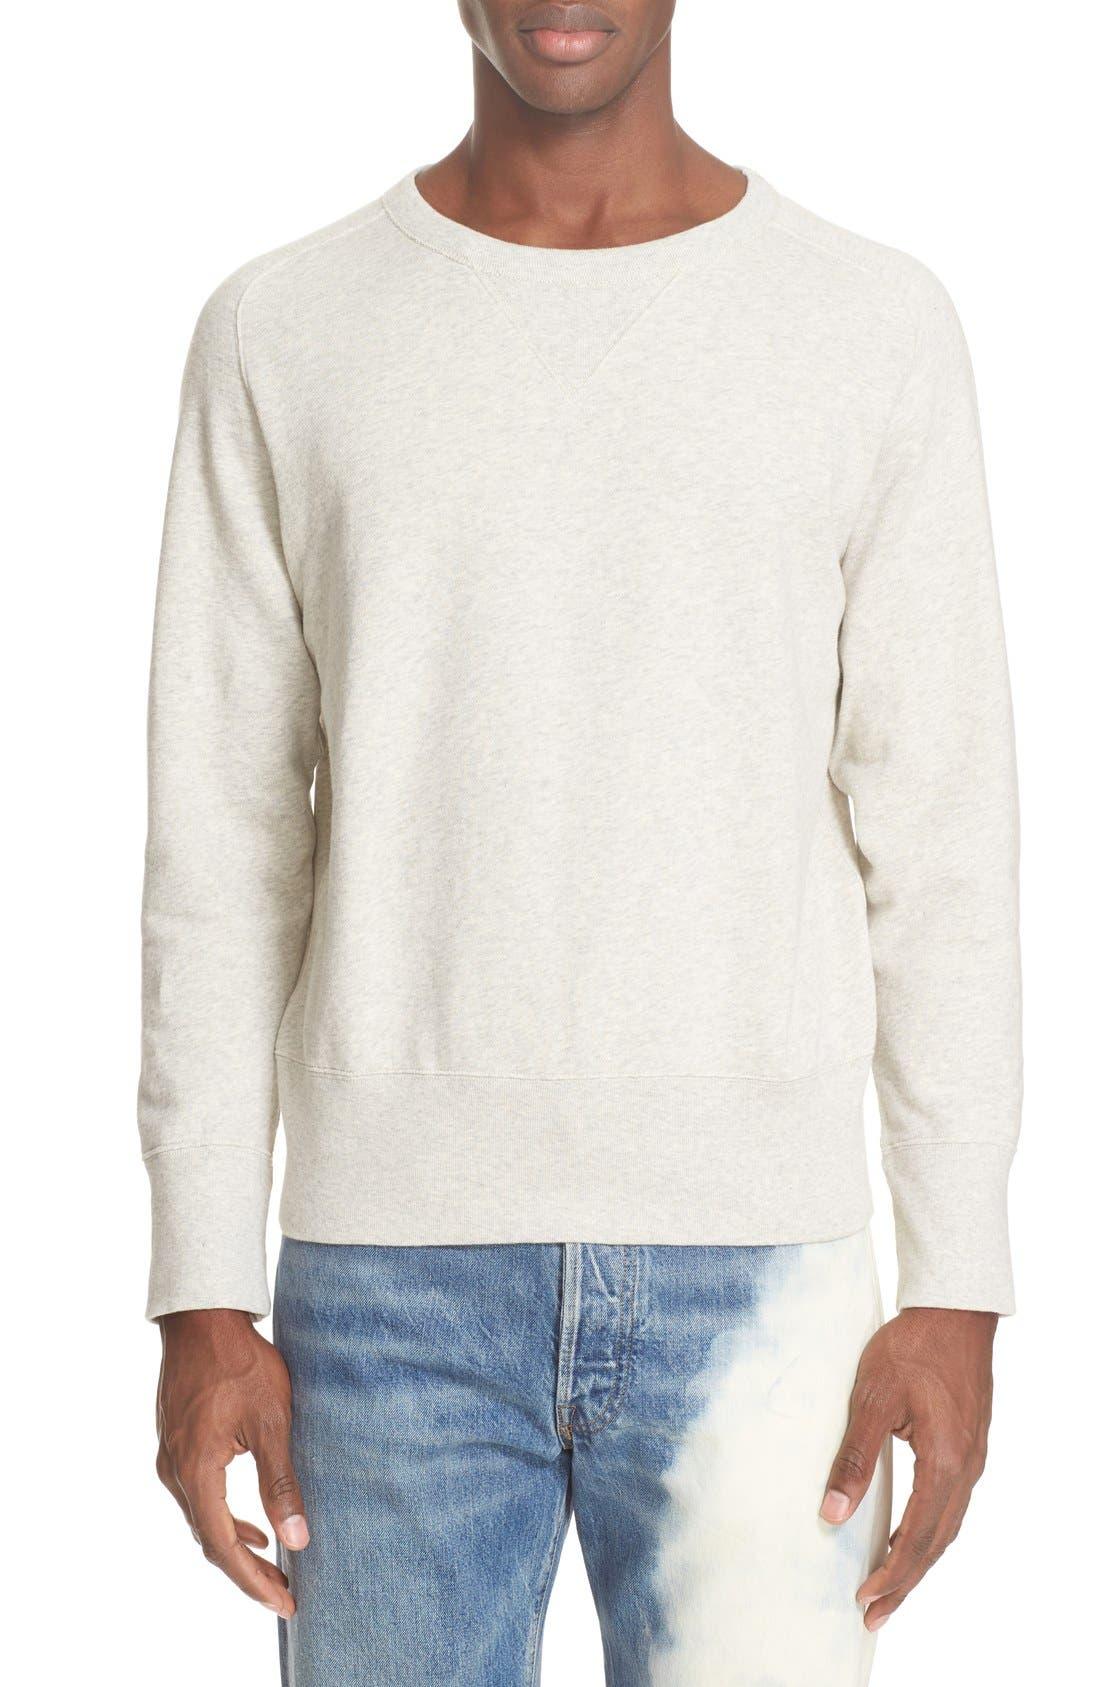 Alternate Image 1 Selected - Levi's® Vintage Clothing Bay Meadows Sweatshirt